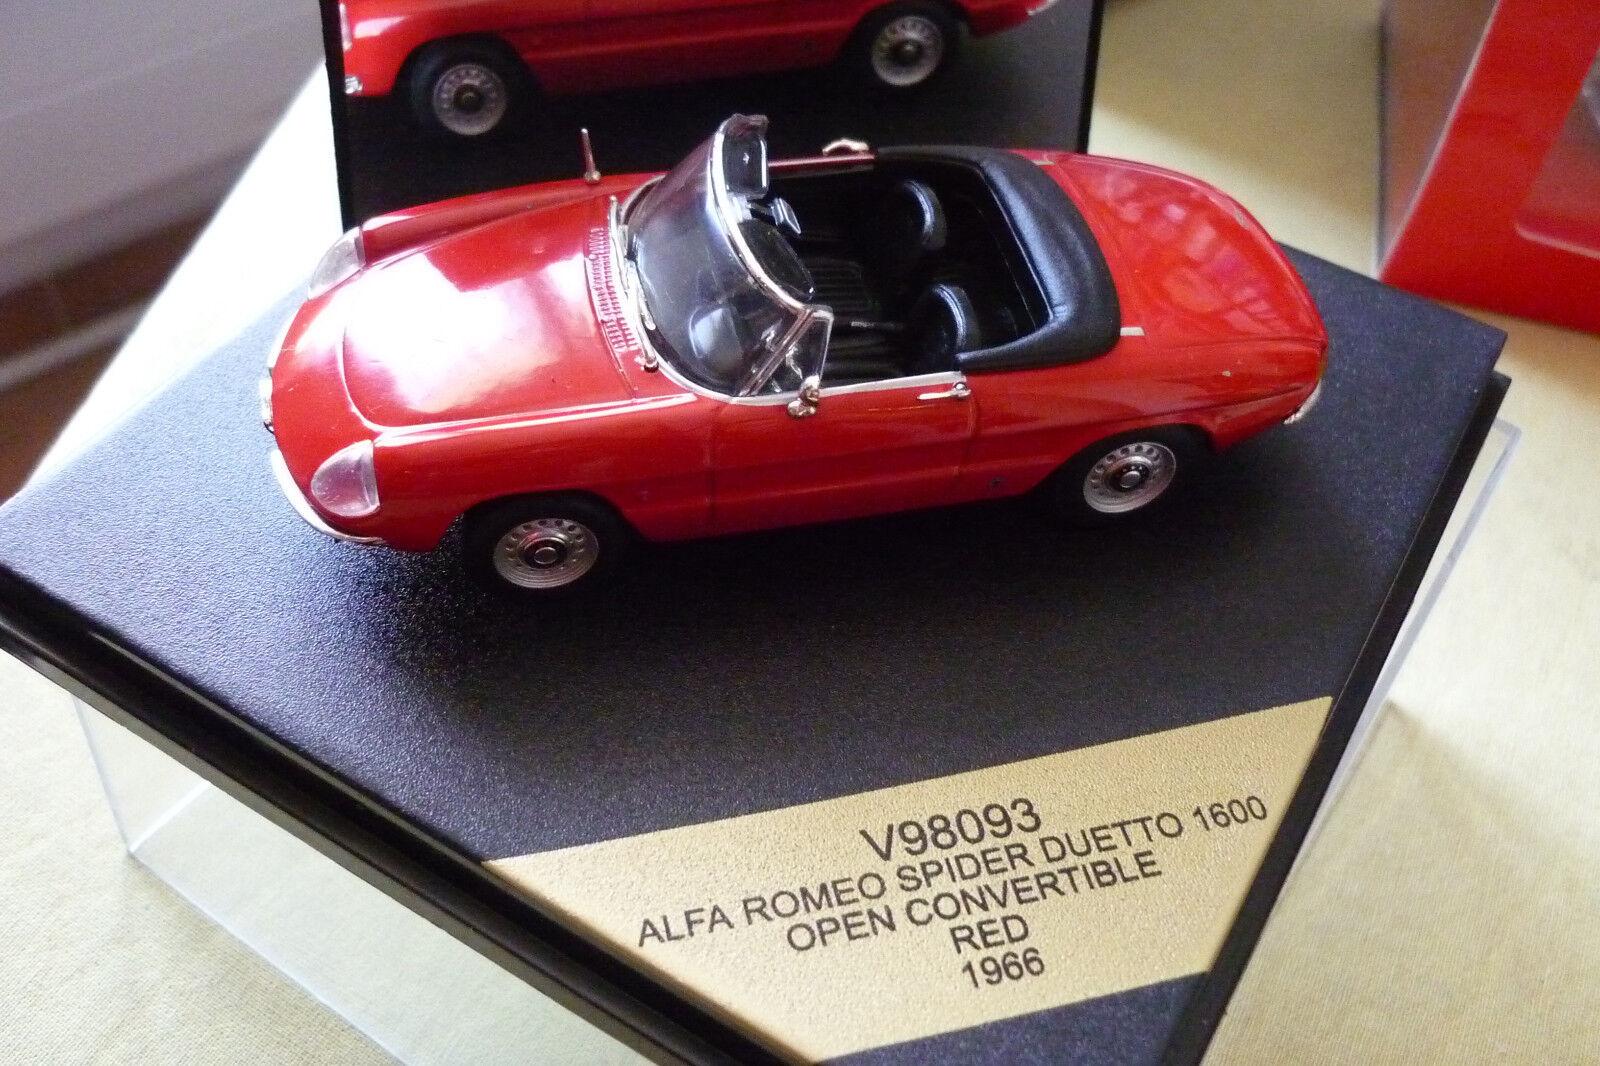 VITESSE 1 43 V98093 ALFA ROMEO SPIDER DUETTO 1600 OPEN CONVERTIBLE rouge 1966